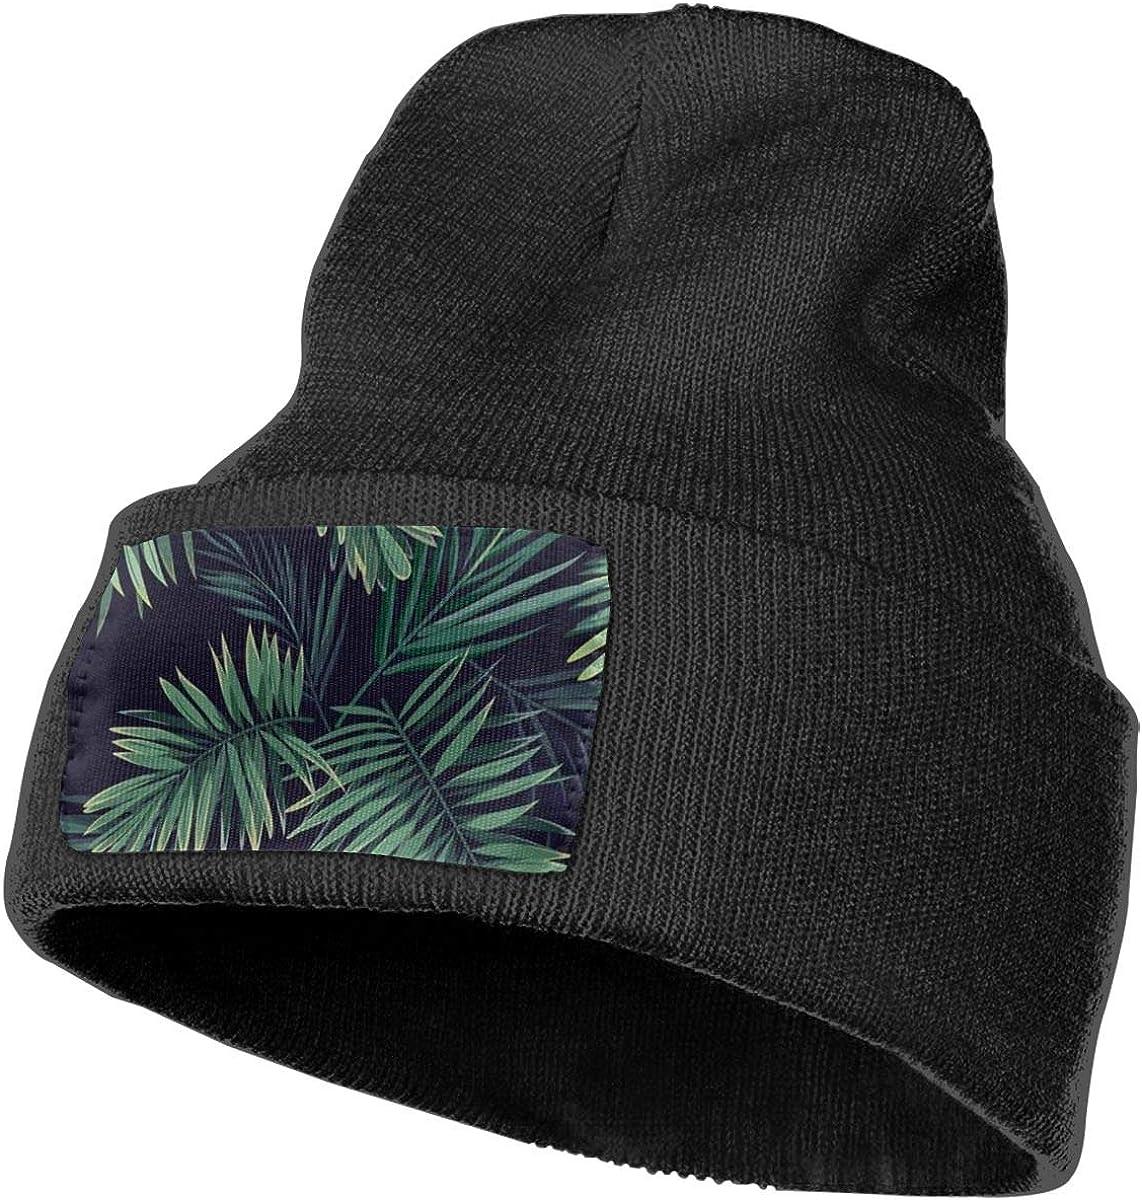 100/% Acrylic Acid Mas Beanie Hat Ruin Plant Fashion Knitting Hat for Men Women